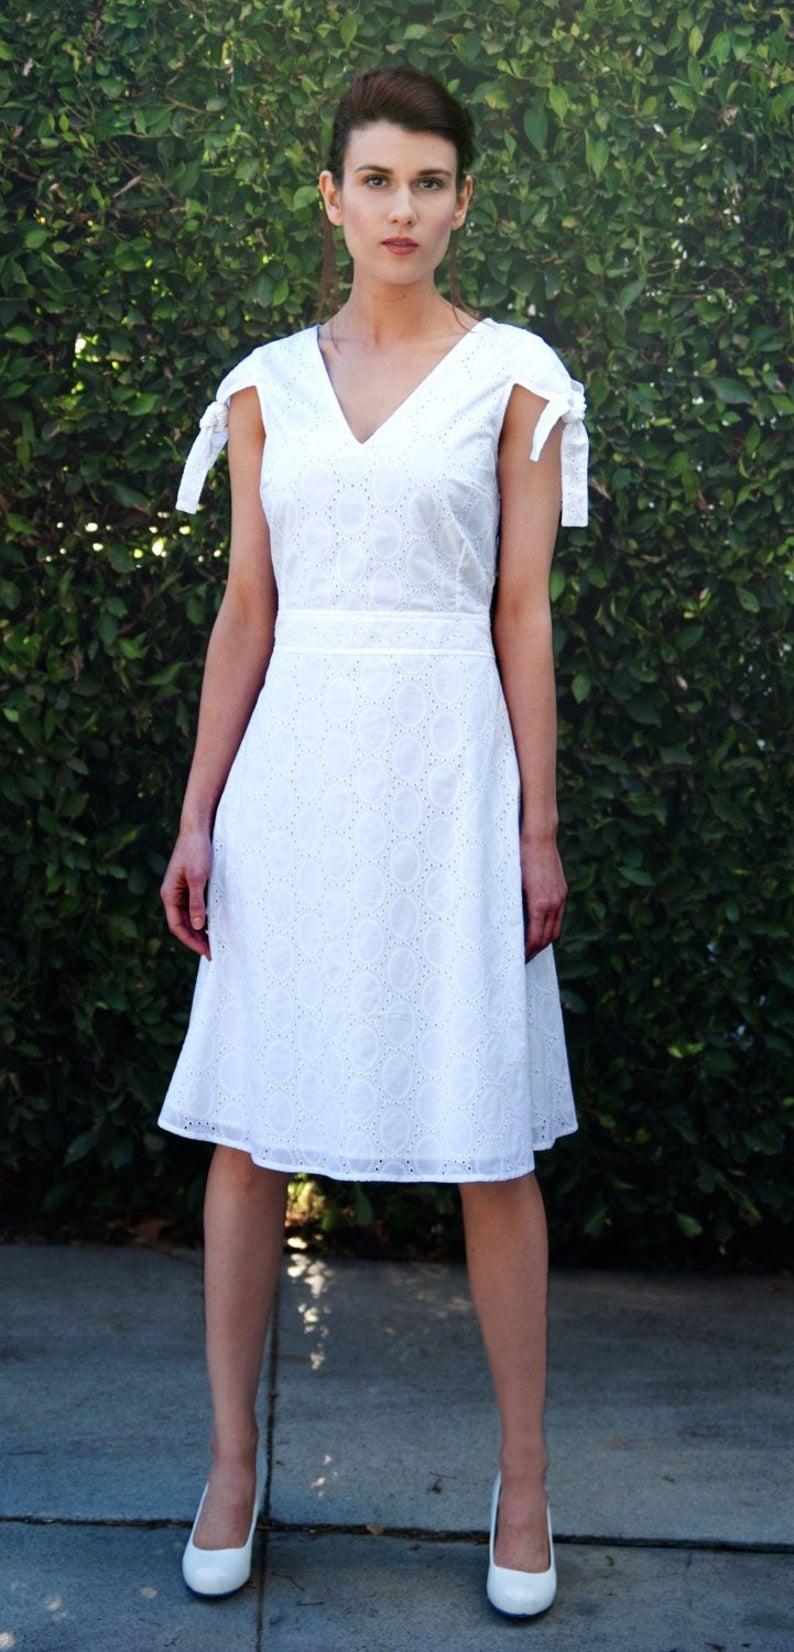 White Midi Dress White Sun Dress Fit And Flare Dress Midi Etsy In 2020 Knee Length Wedding Dress Wedding Dress Fabrics Casual Wedding Dress [ 1652 x 794 Pixel ]